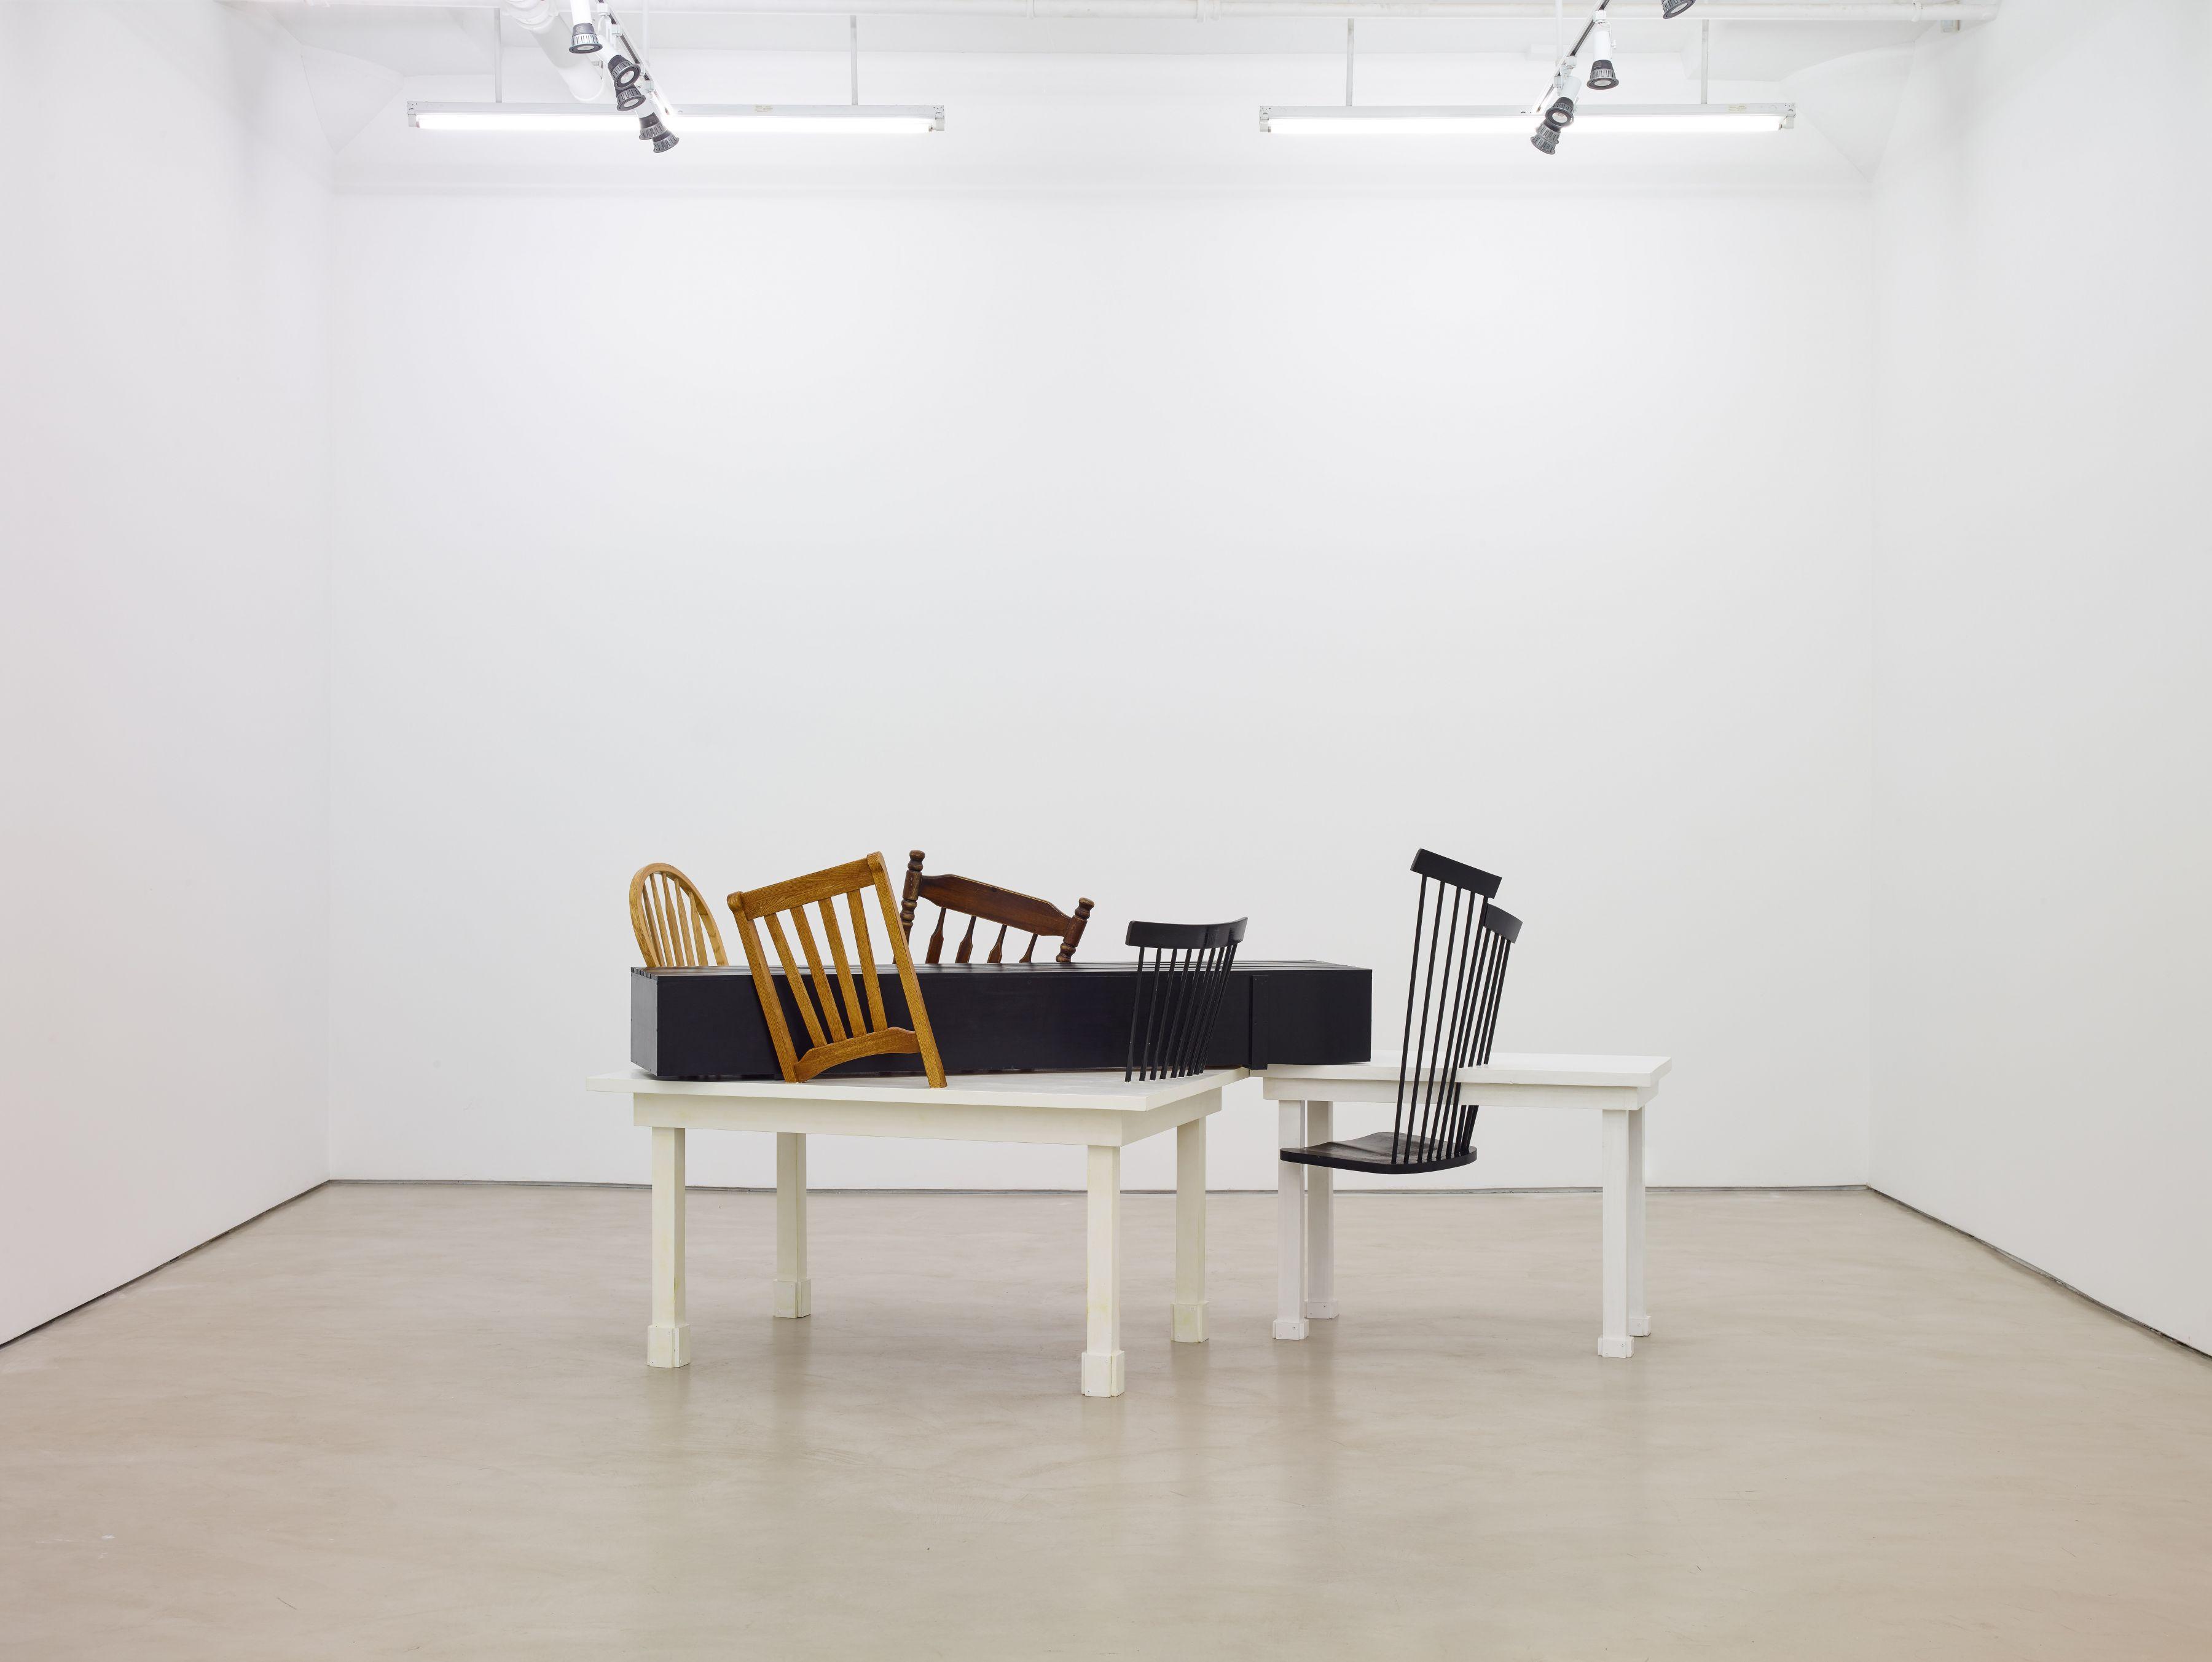 Siah Armajani, installation view, Alexander Gray Associates, 2016